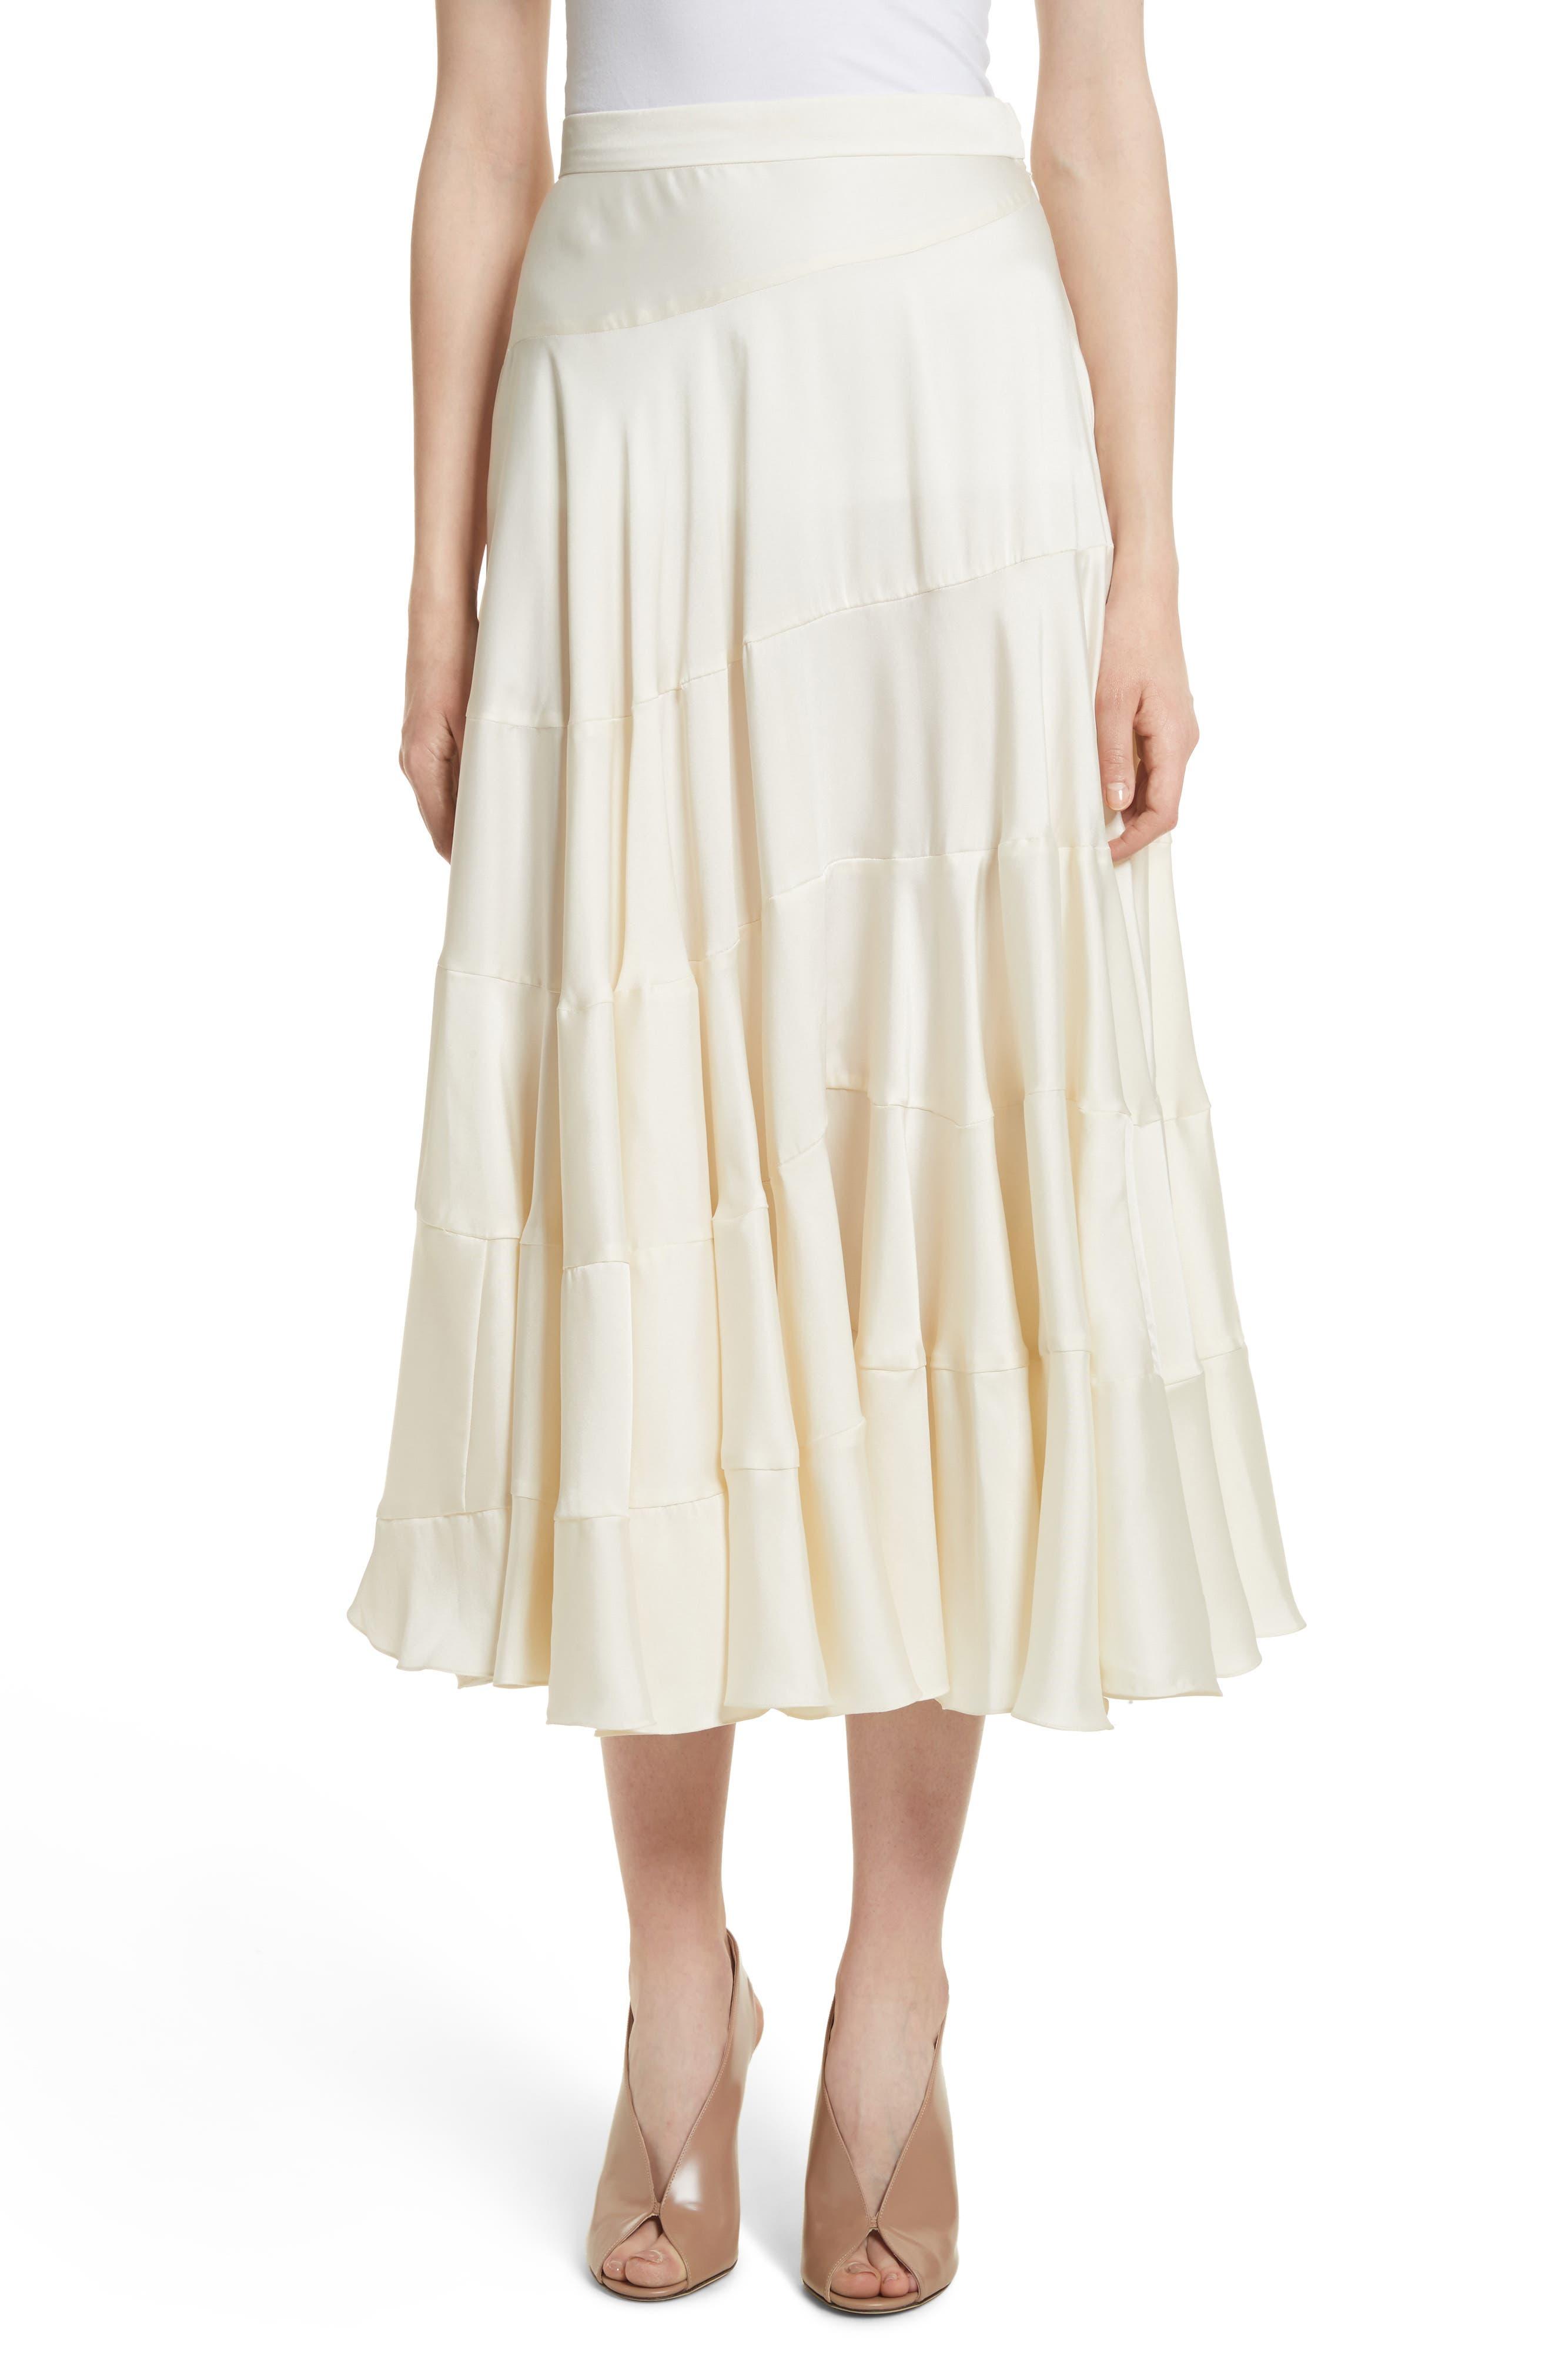 Elizabeth and James Lasse Satin Paneled Midi Skirt